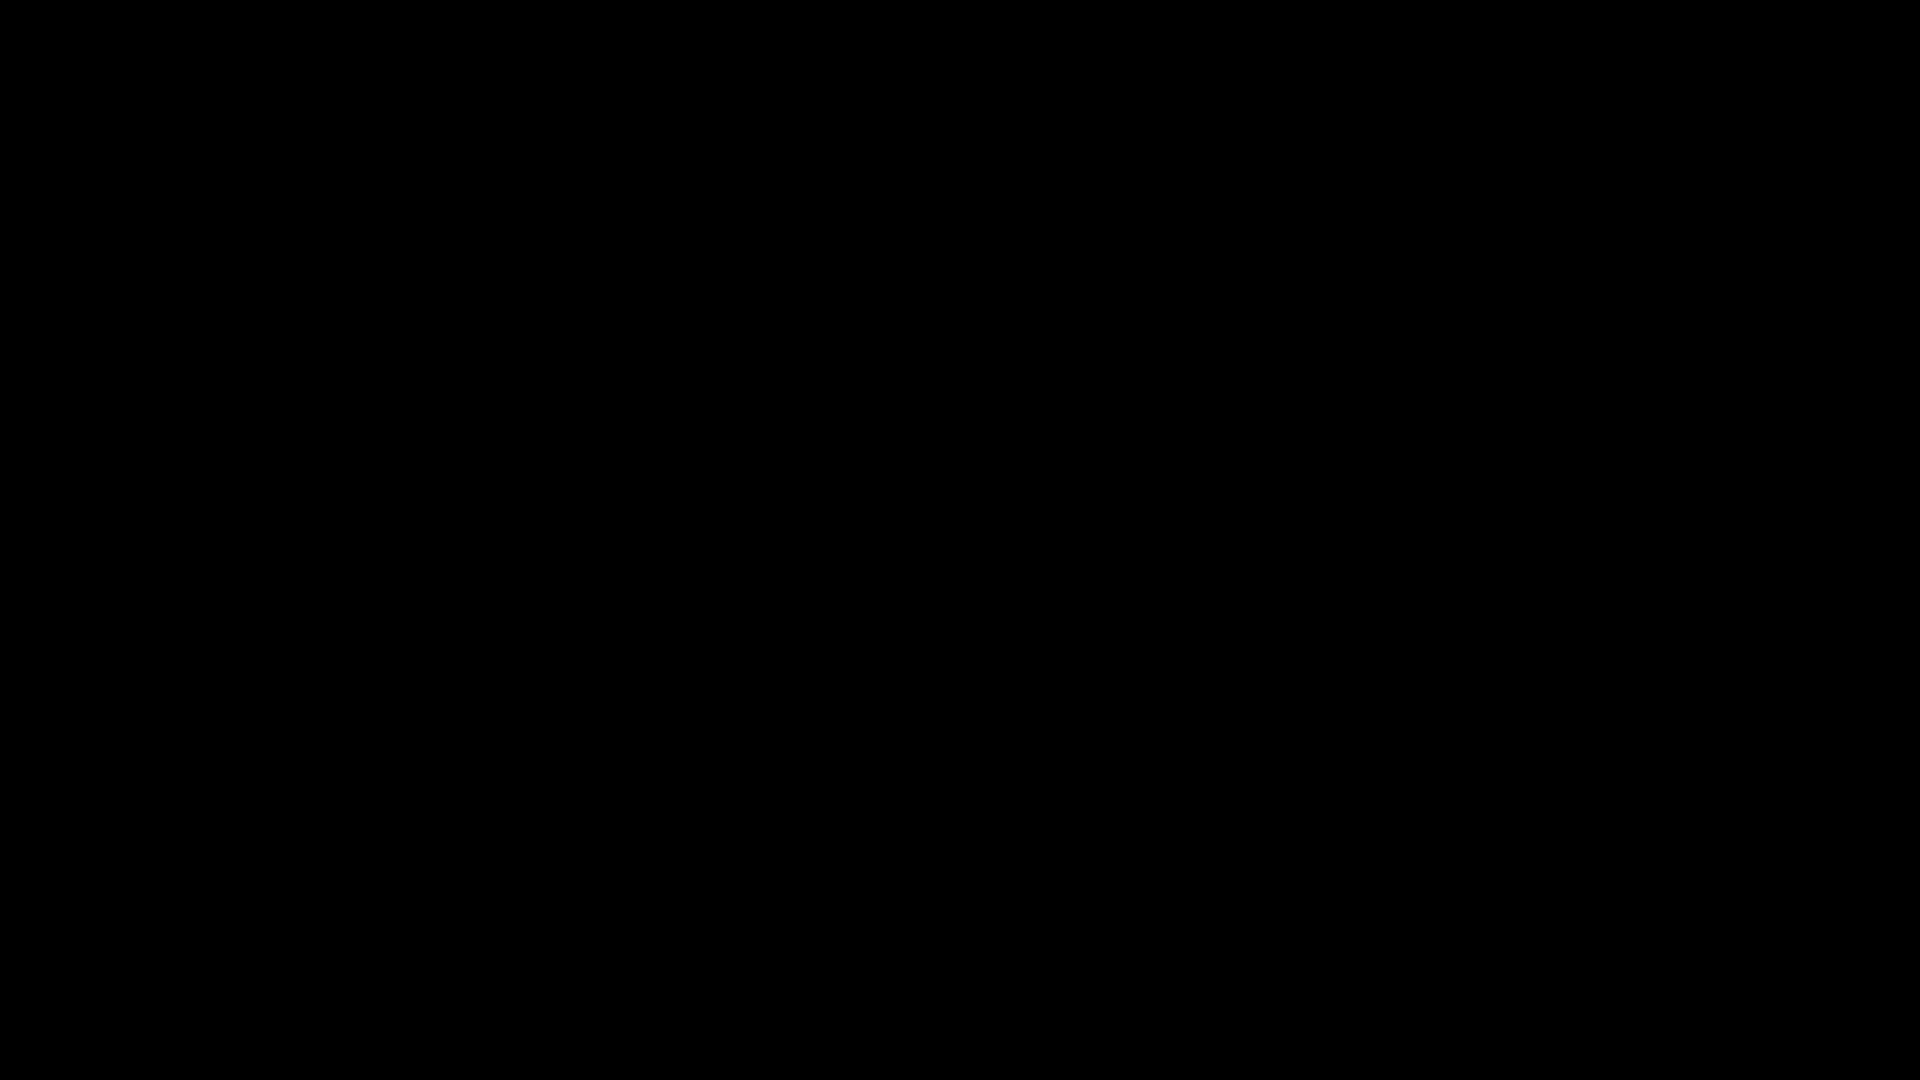 black wallpaper hd | aslania